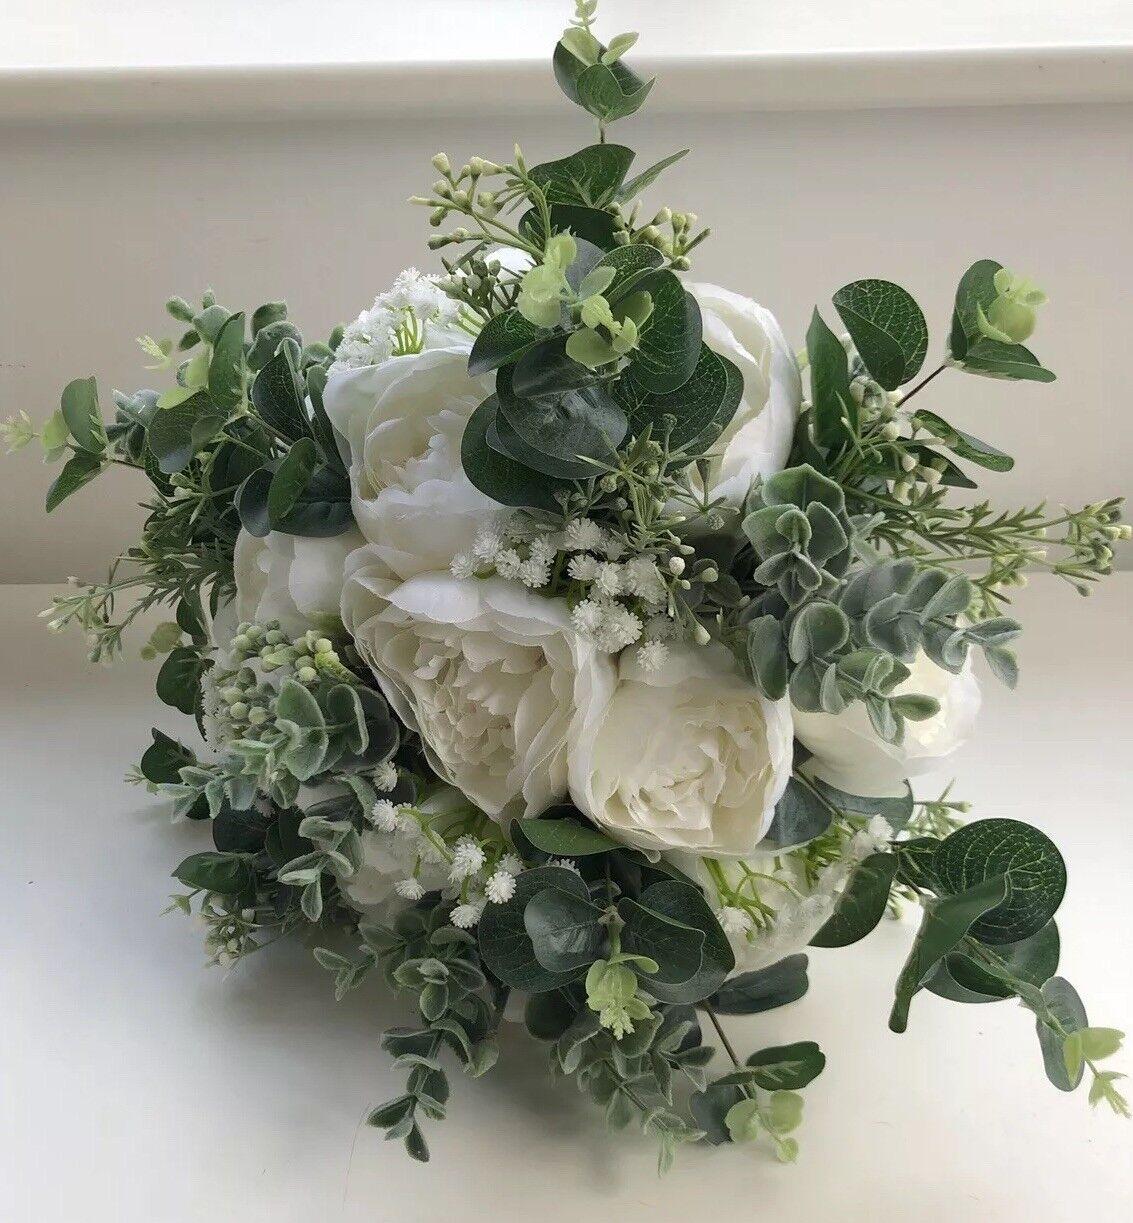 PEONY BOUQUET BRIDE BROOCH WEDDING FLOWERS Weiß GrößeRY EUCALYPTUS MODERN